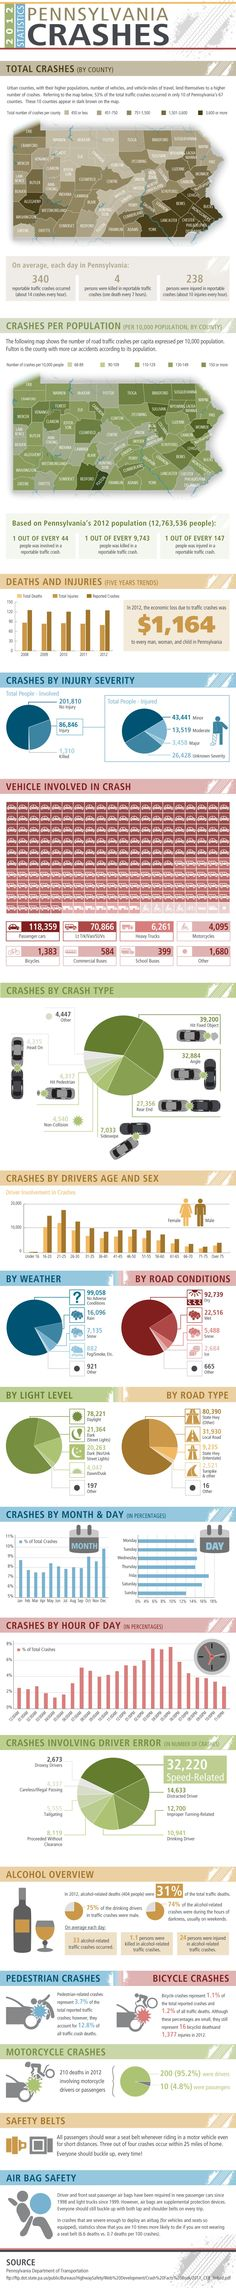 Infographic: Car Accidents Pennsylvania Statistics